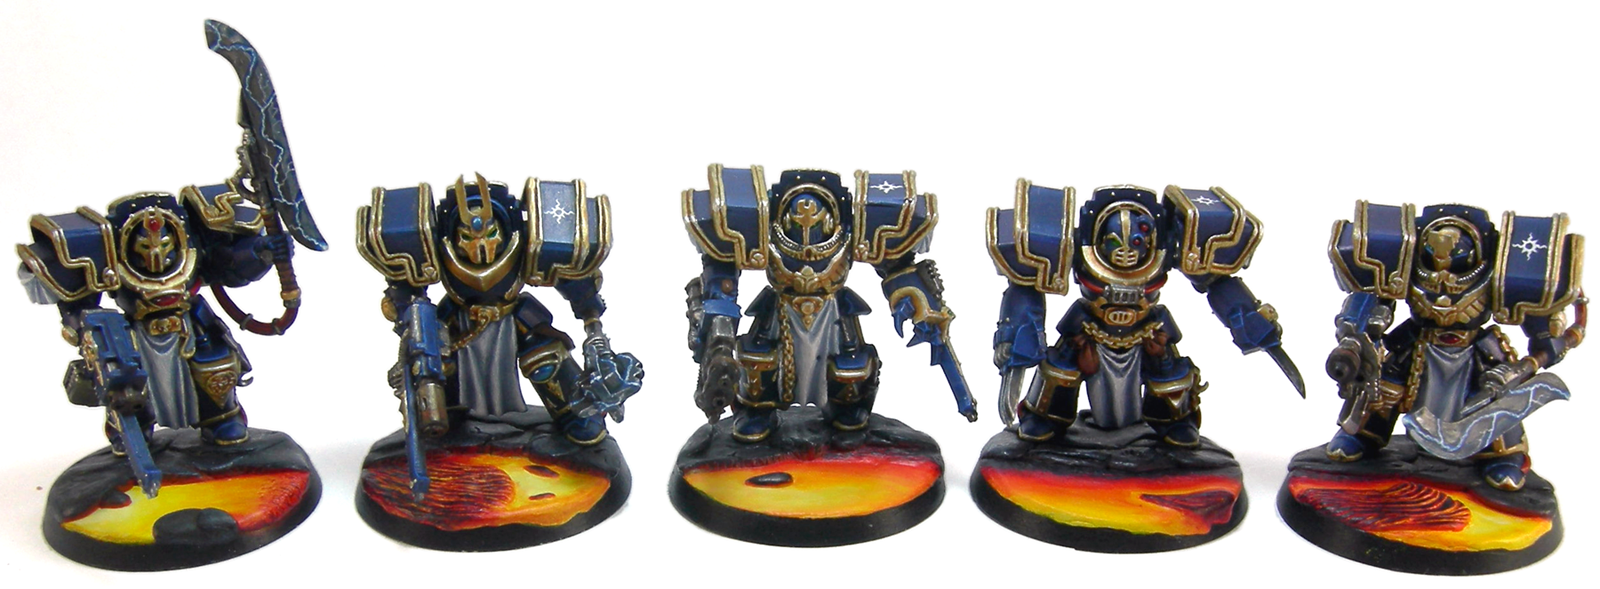 Terminator Armor, Thousand Sons